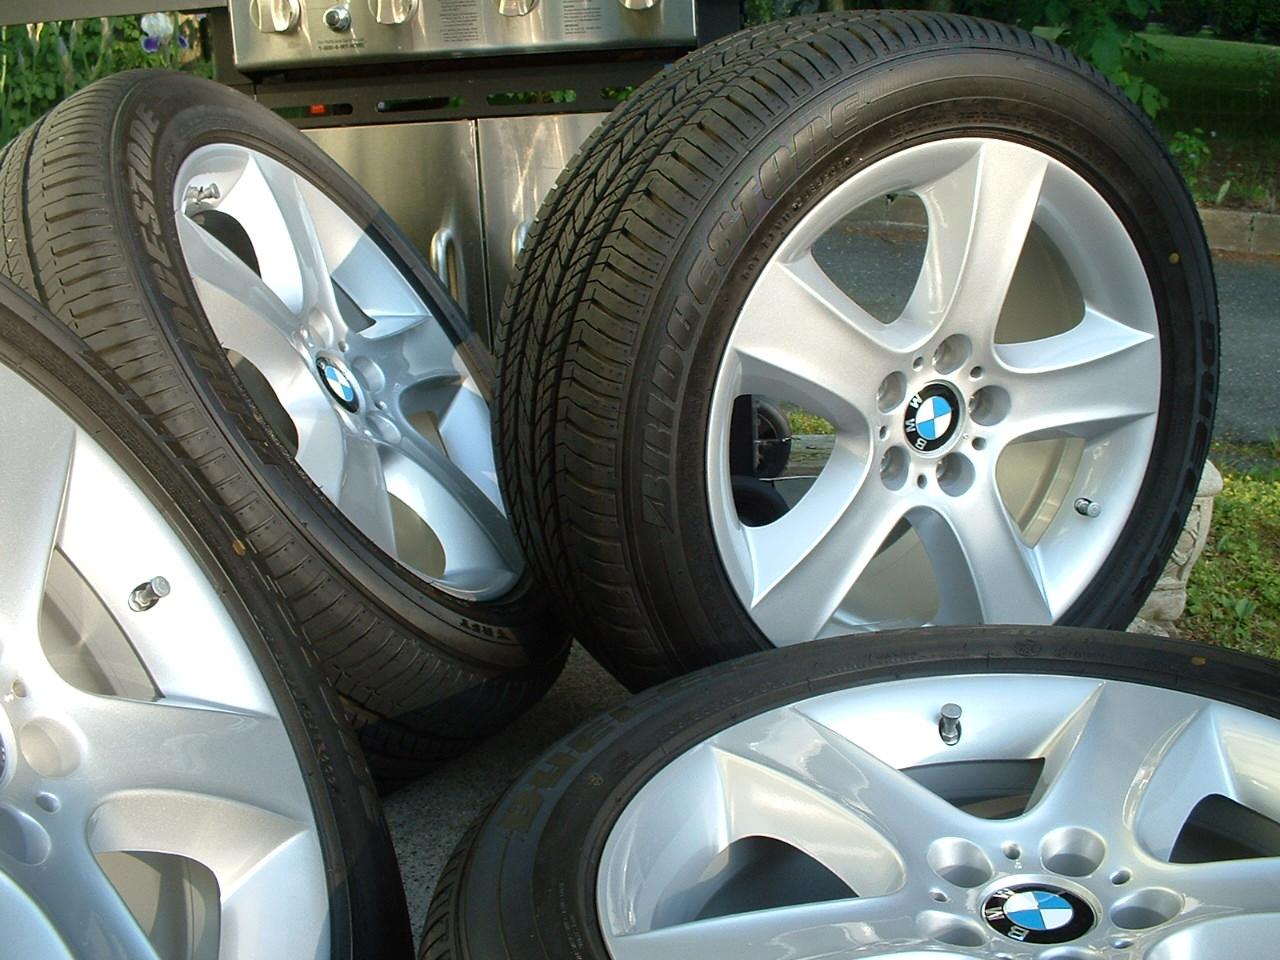 new 2010 bmw x5 19 wheels tires tpms. Black Bedroom Furniture Sets. Home Design Ideas